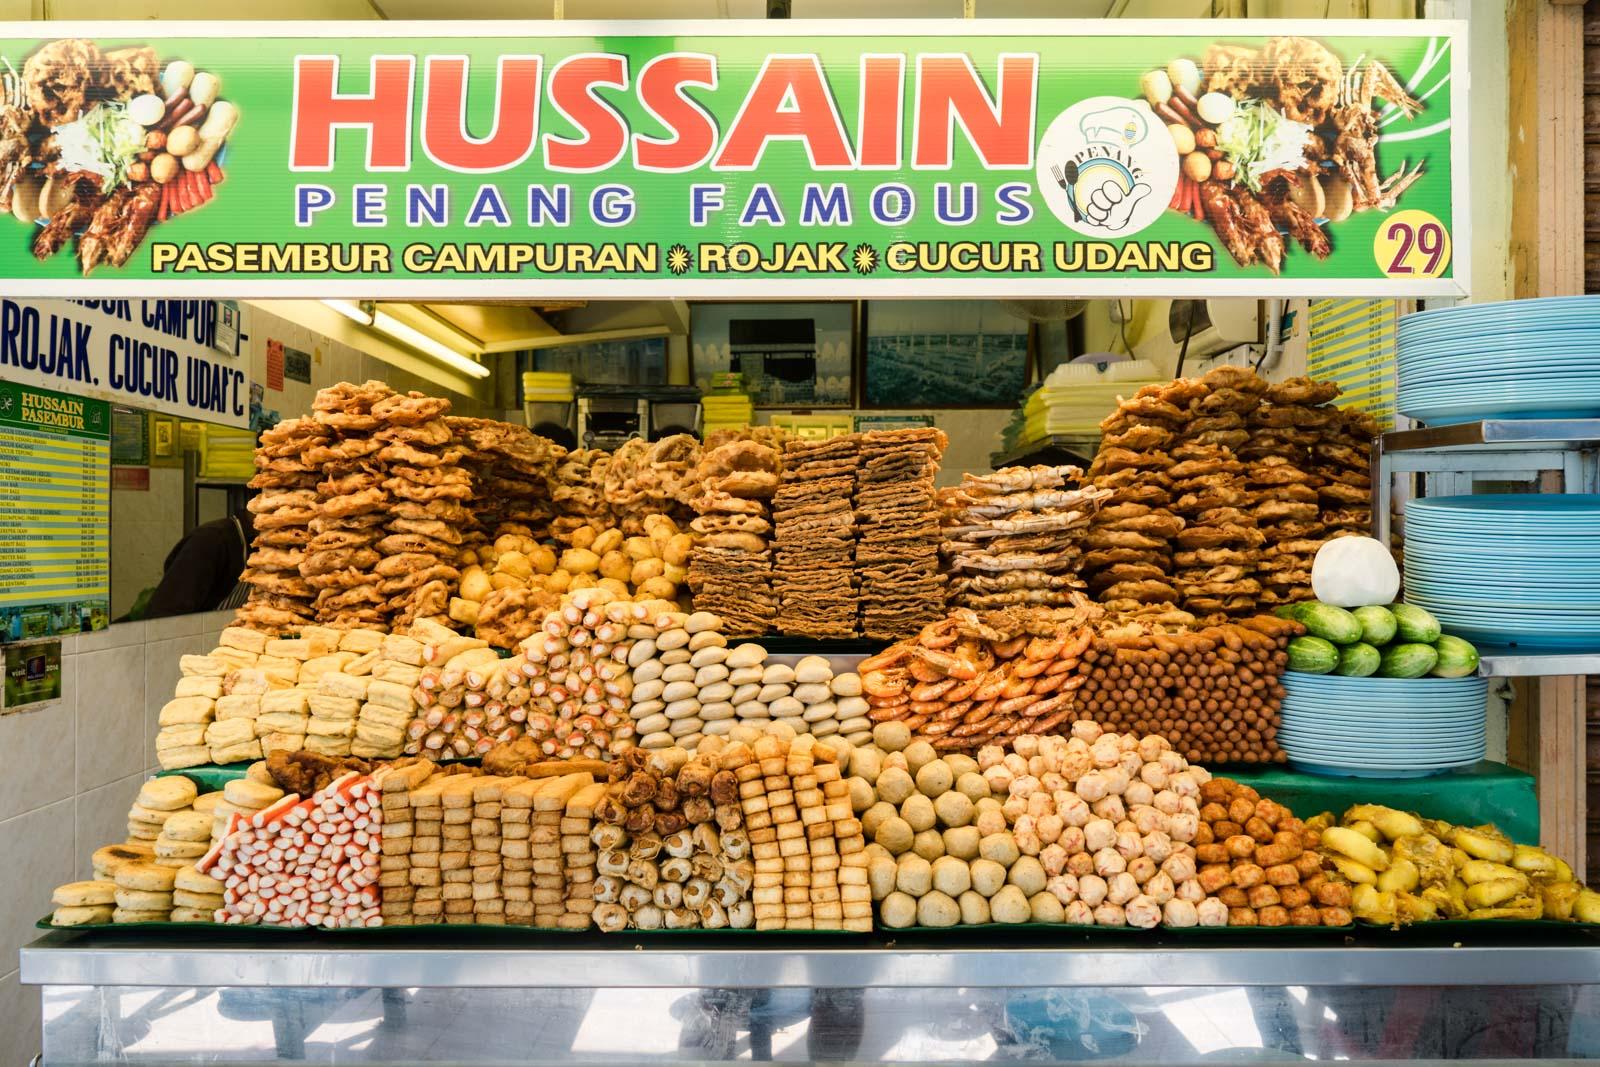 Pasembur, Penang, Malaysia